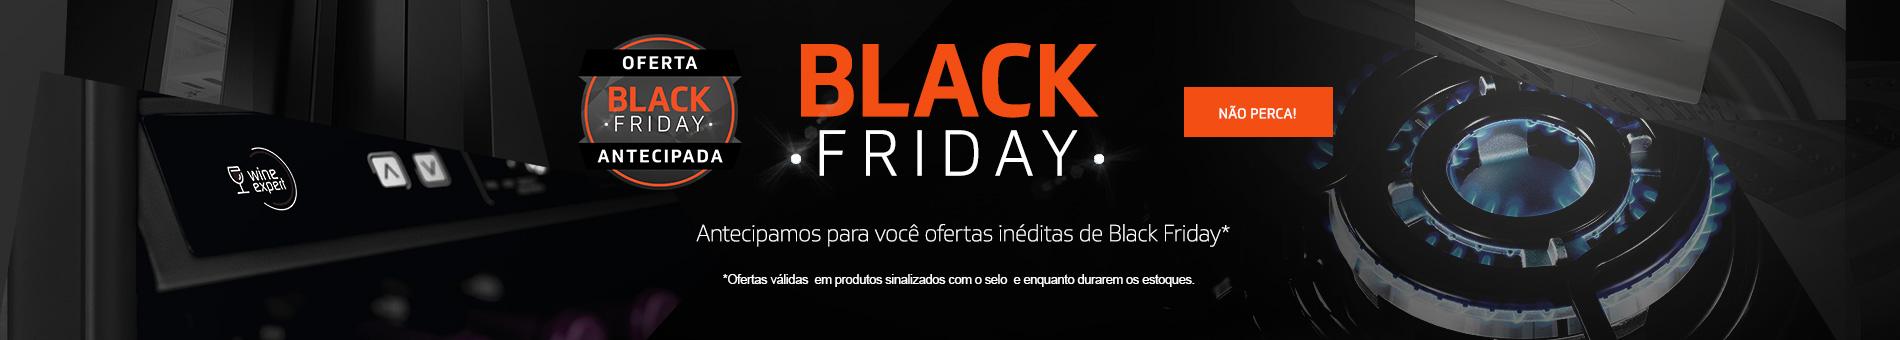 Promoção Interna - 1047 - ofertaantecipada_blackfriday_28102016_home6 - blackfriday - 6